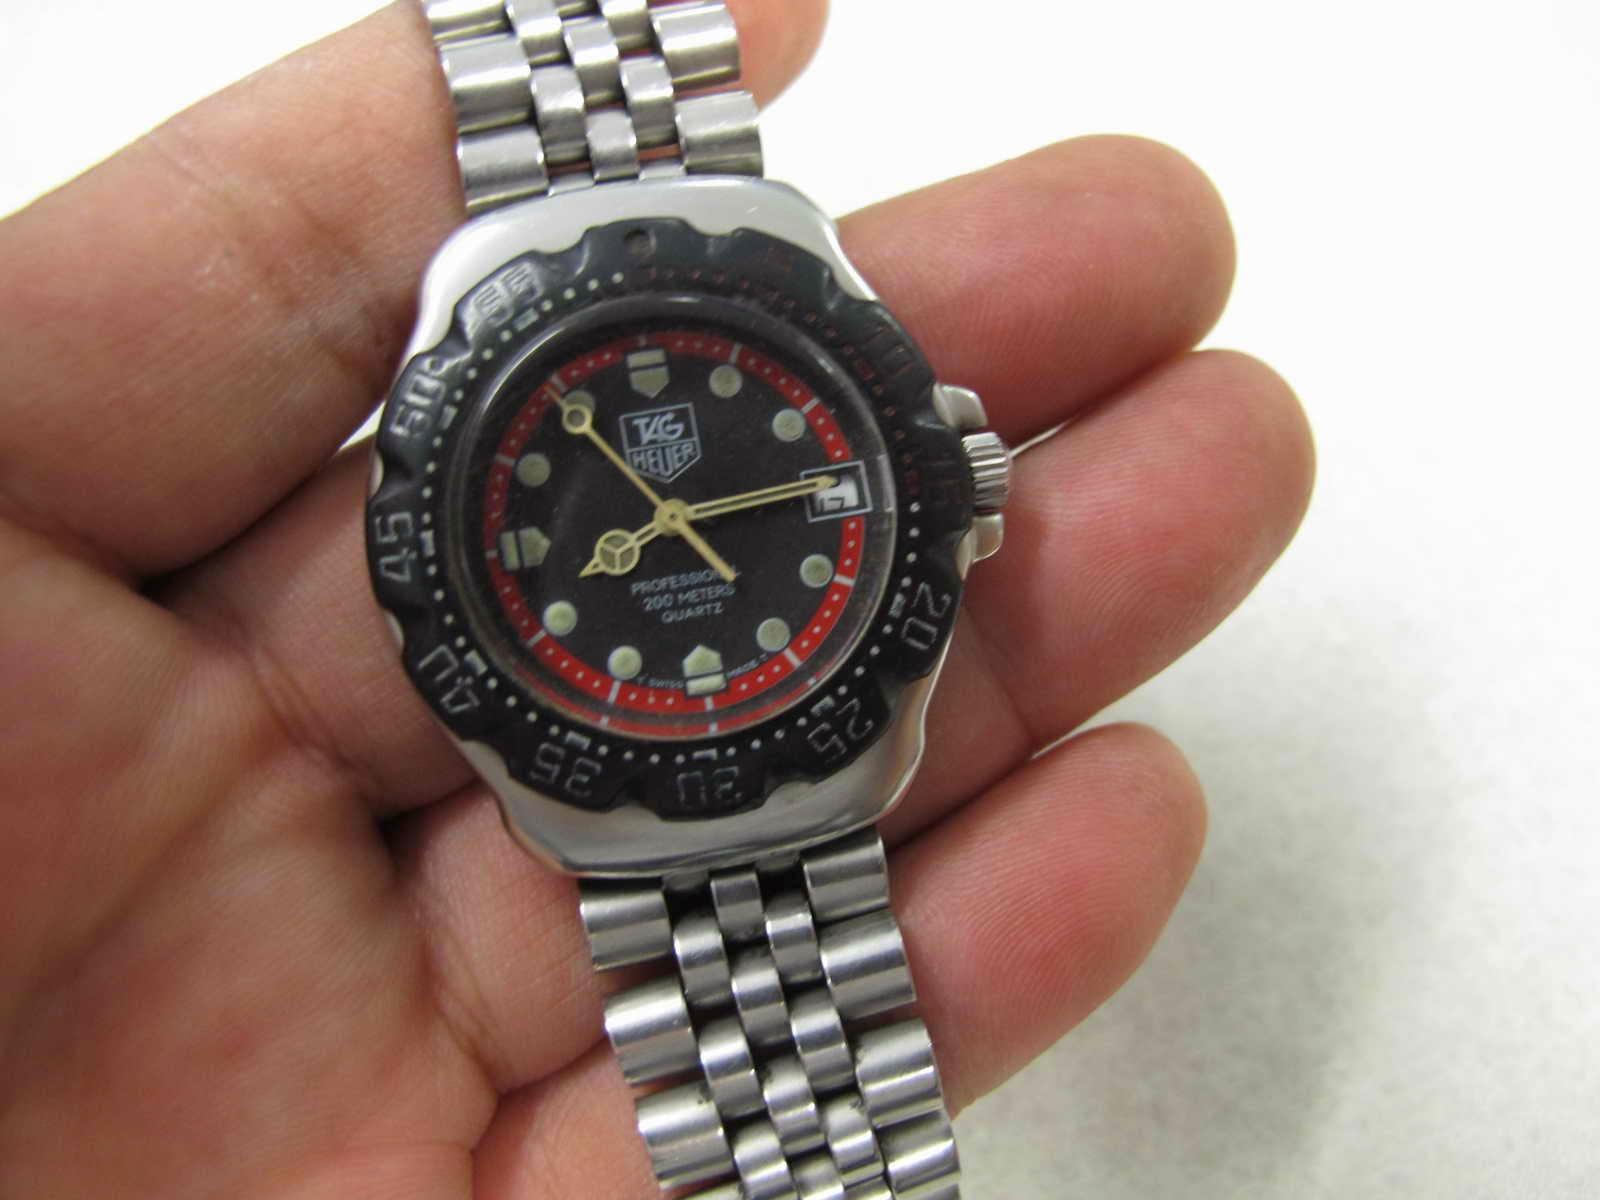 Dapat dipakai sebagai jam harian dan cocok untuk Anda yang sedang mencari jam tangan Swiss made dengan diameter yang tidak terlalu besar pas di tangan